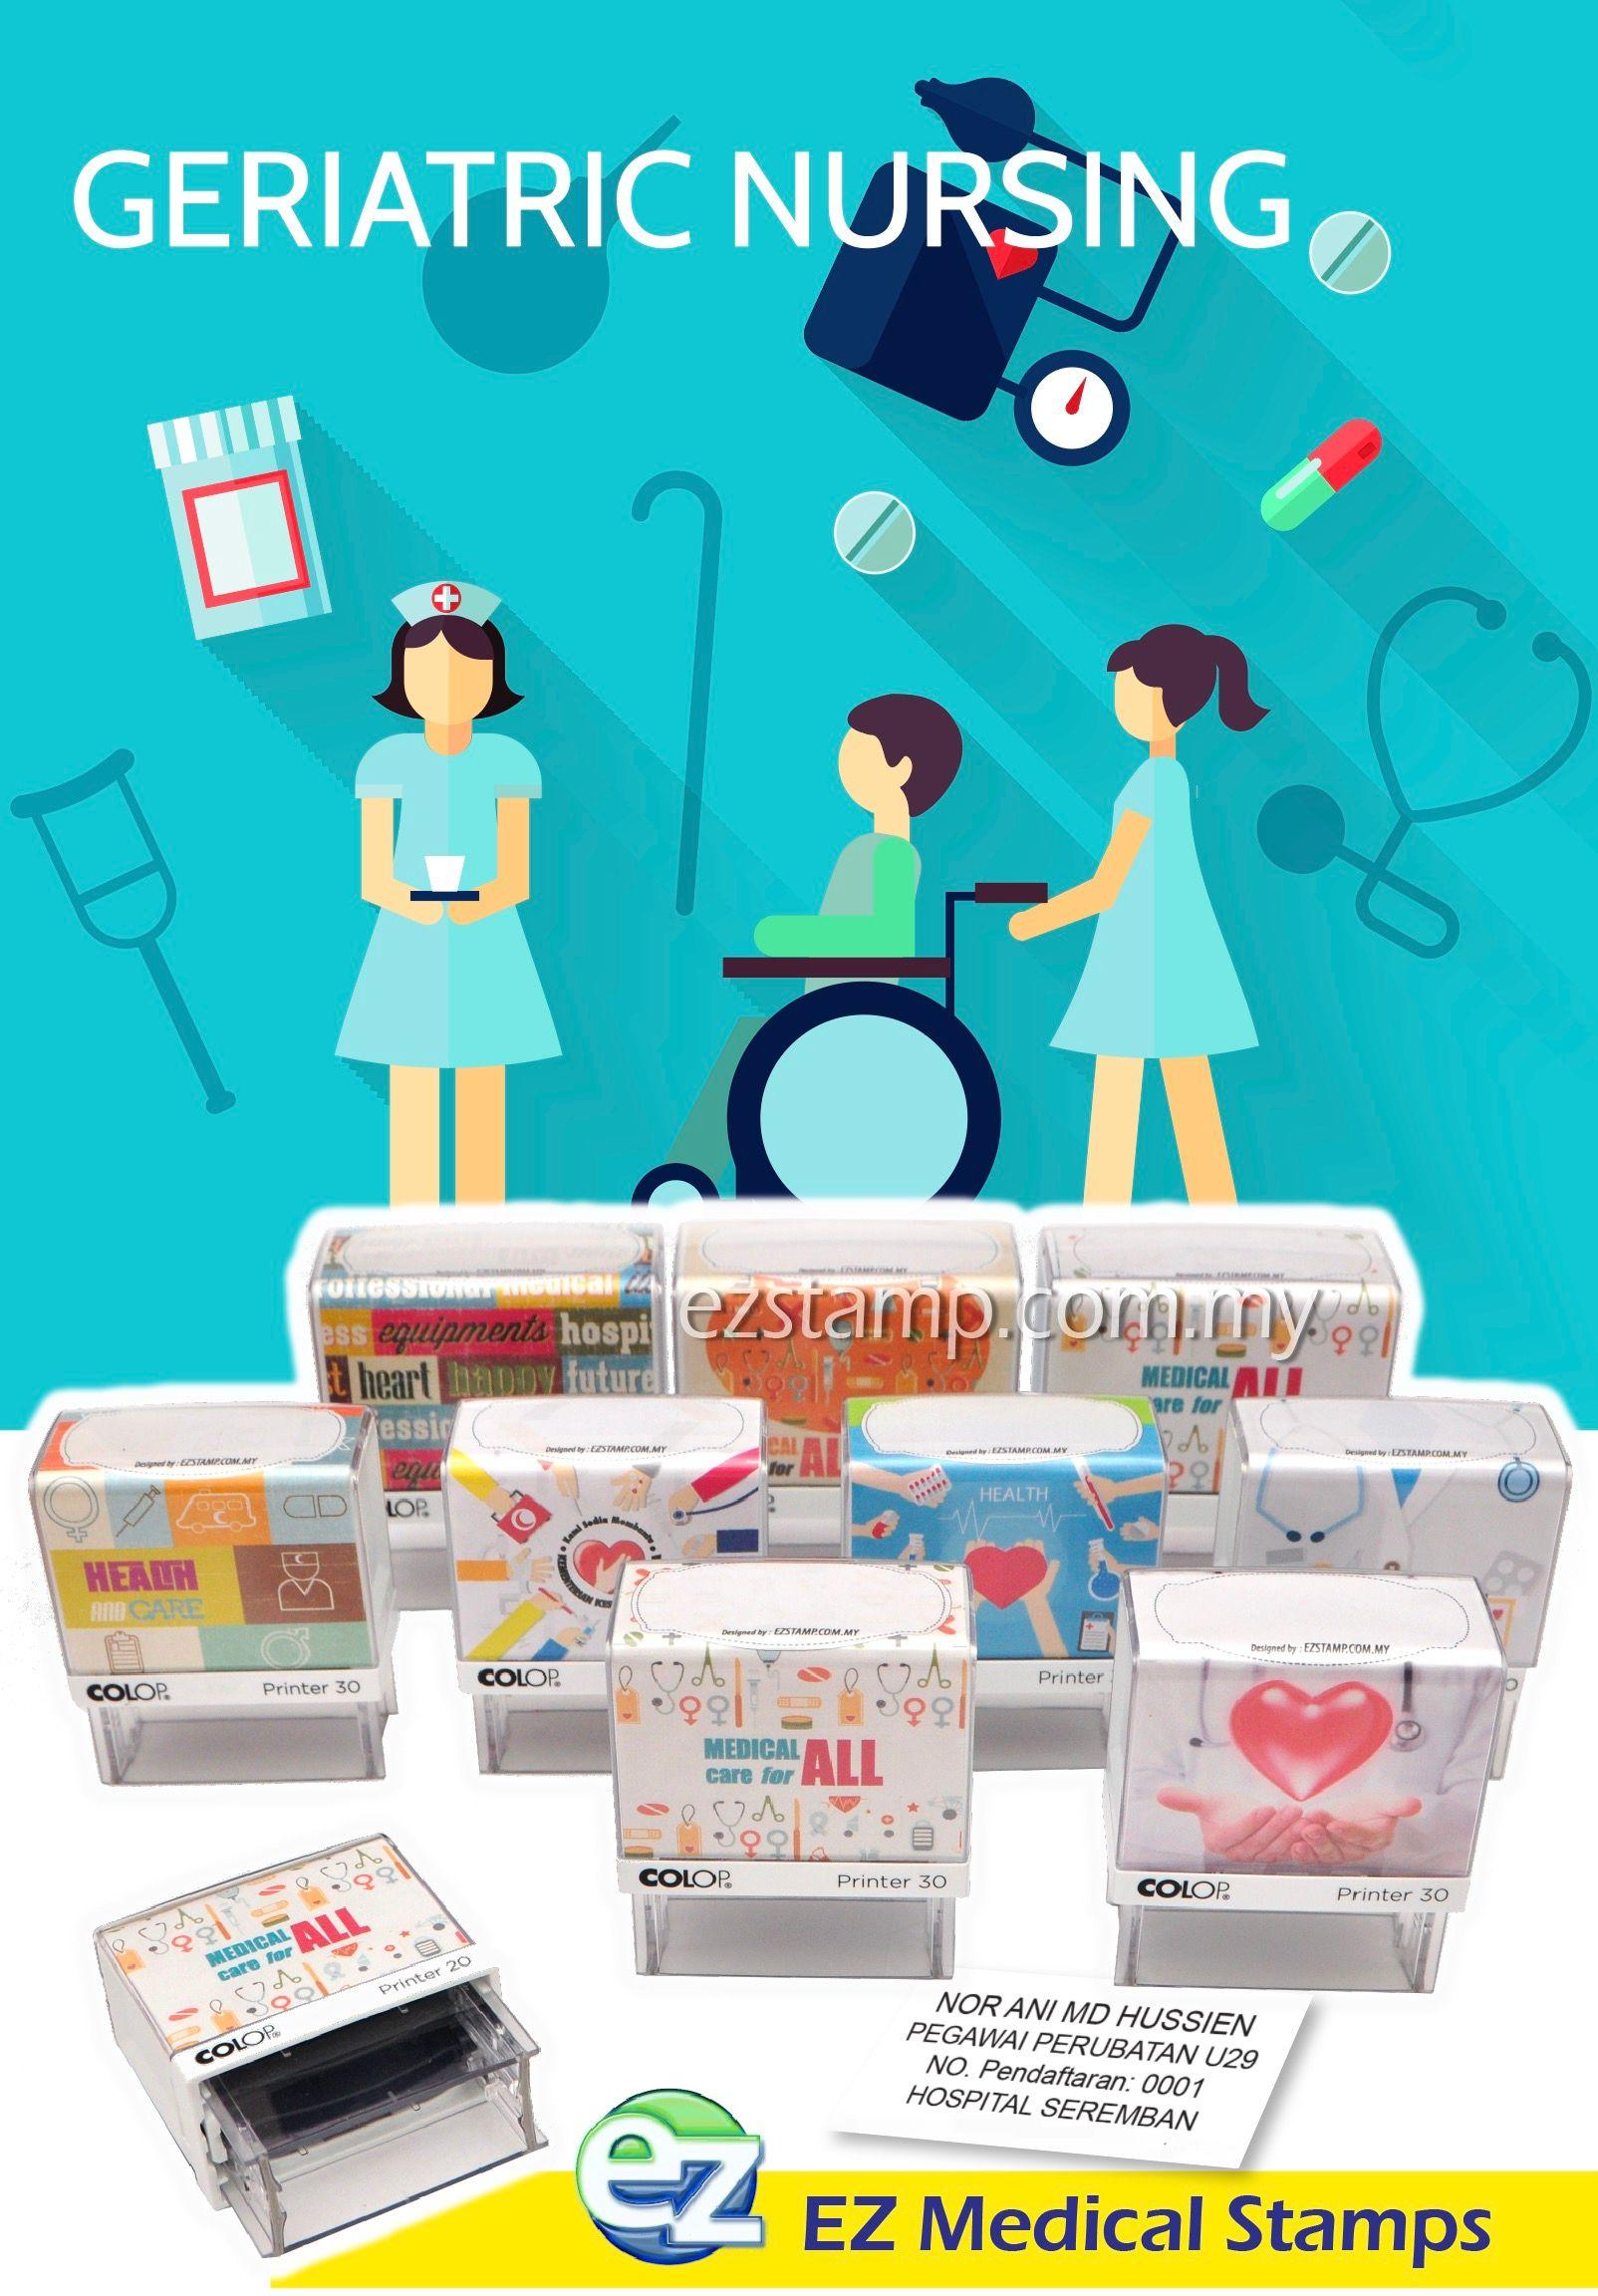 Ez Stamp Cop Utk Pegawai Perubatan, Nurses, Doctor Di Malaysia